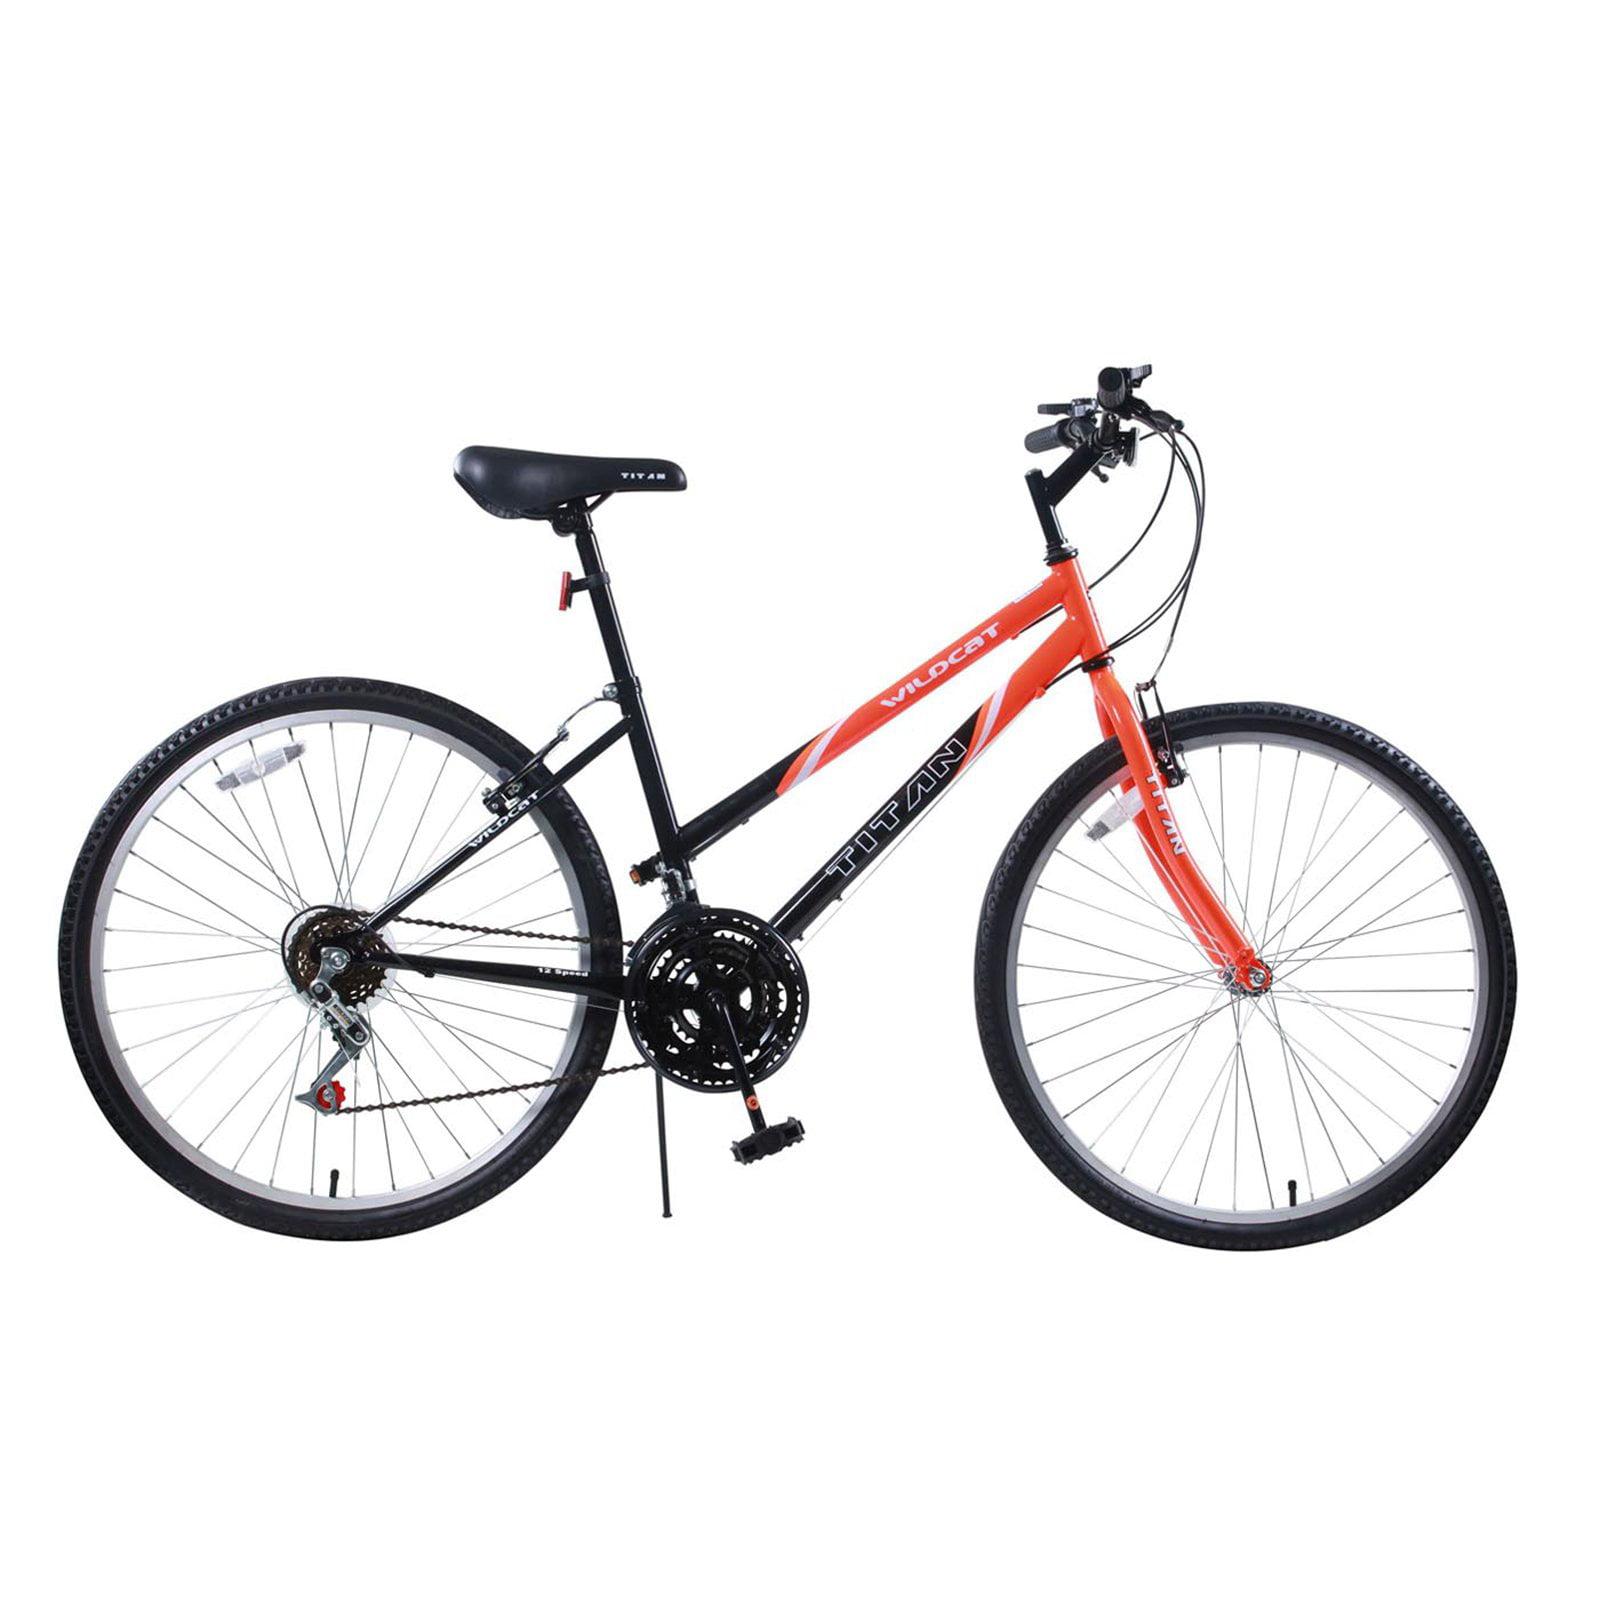 Titan Wildcat Women's 12-Speed Hardtail Mountain Bike, Orange/Black